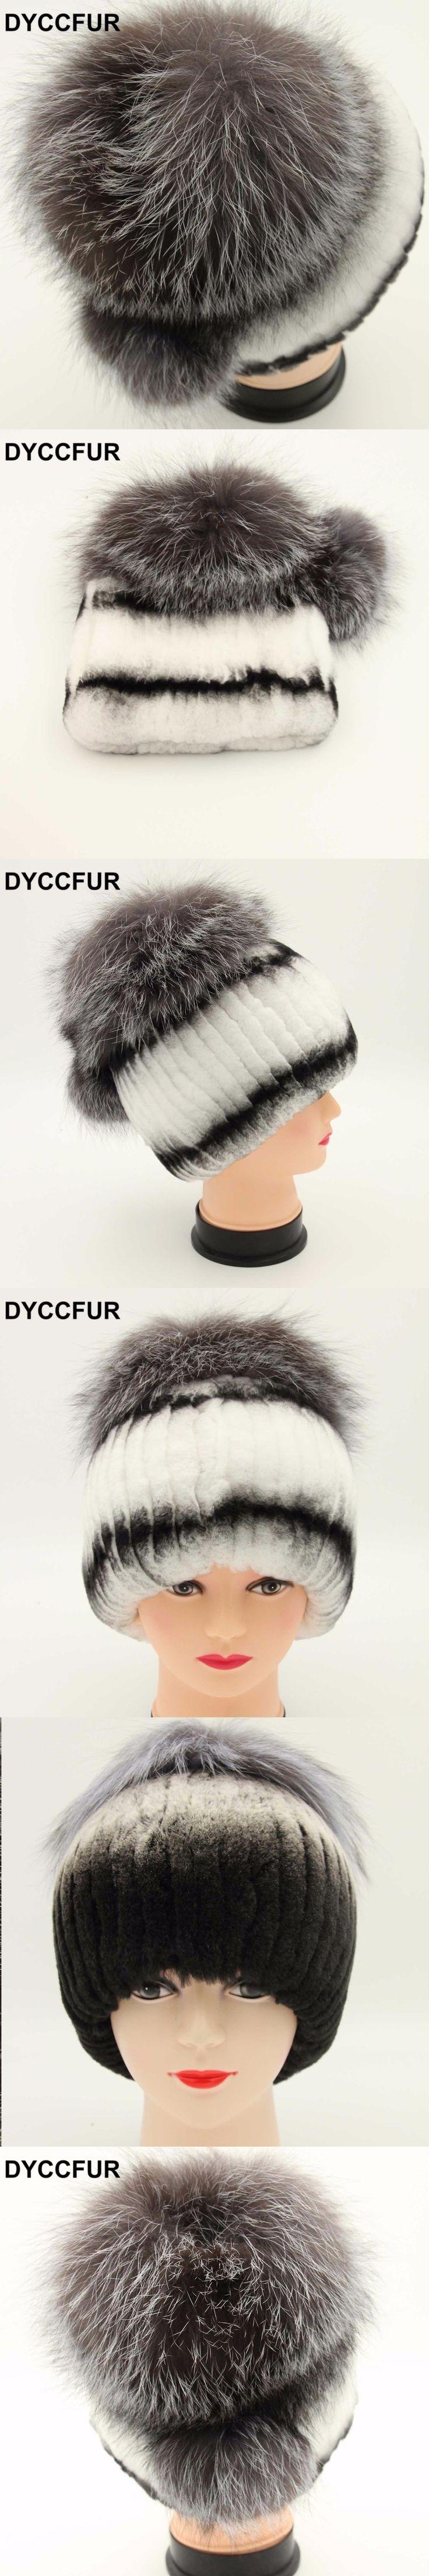 DYCCFUR 2017 new women winter real fur hat with silver fox fur top female elastic knitted cap rex rabbit fur hat Beanies